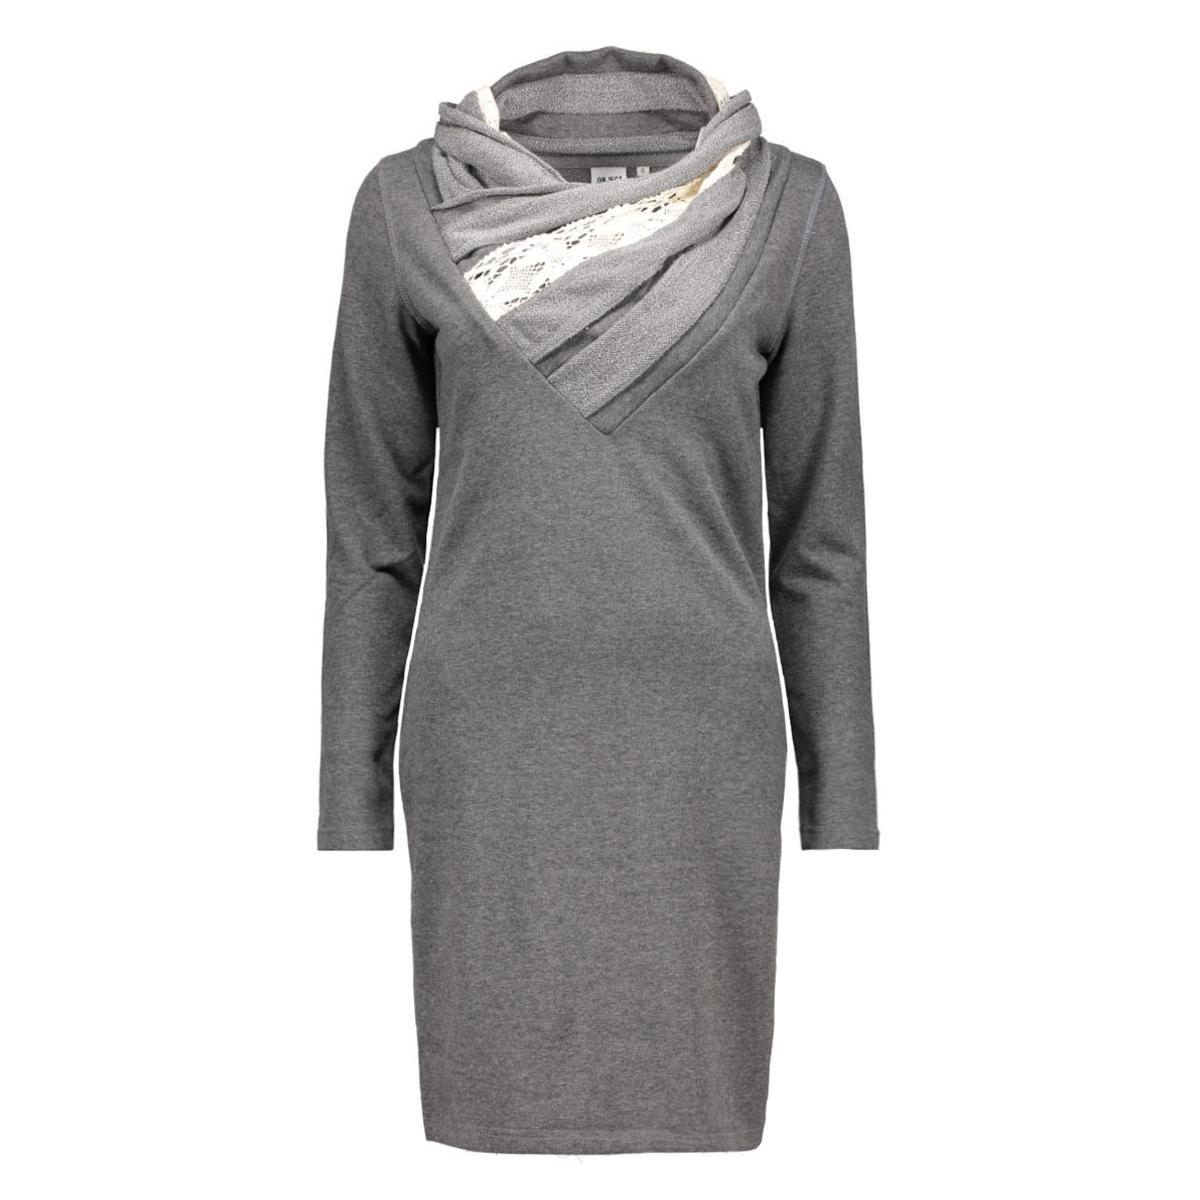 objtammy dress 23021471 object jurk medium grey melange